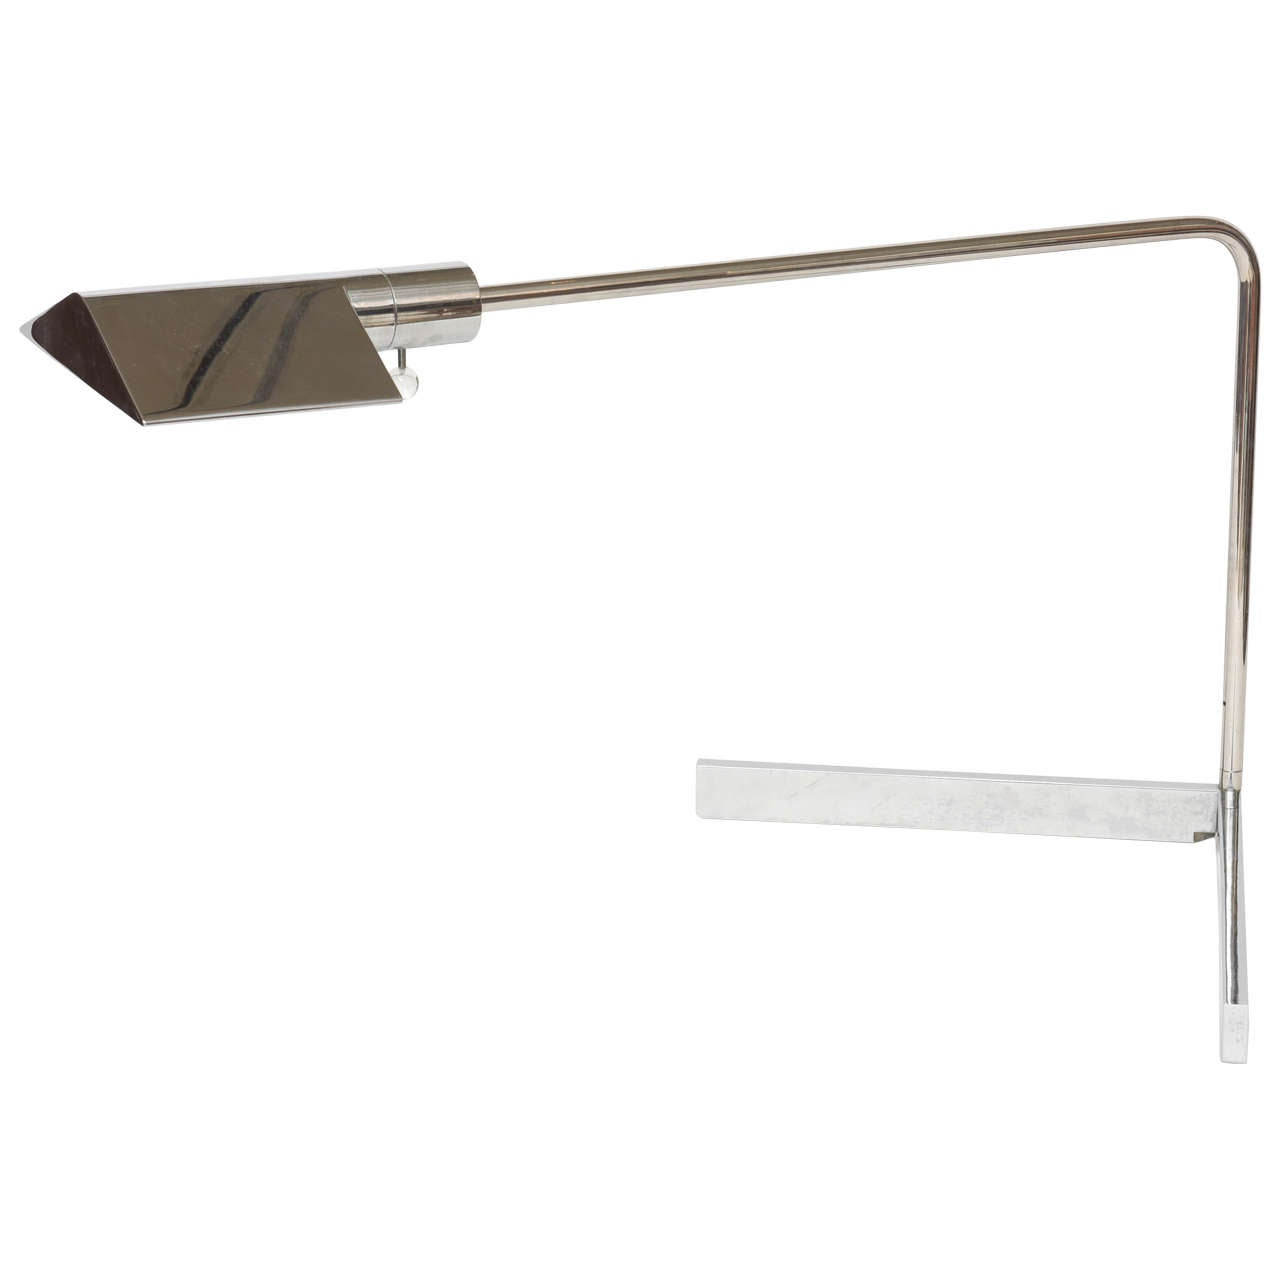 Early Cedric Hartman American Modern Polished Chrome Desk Lamp